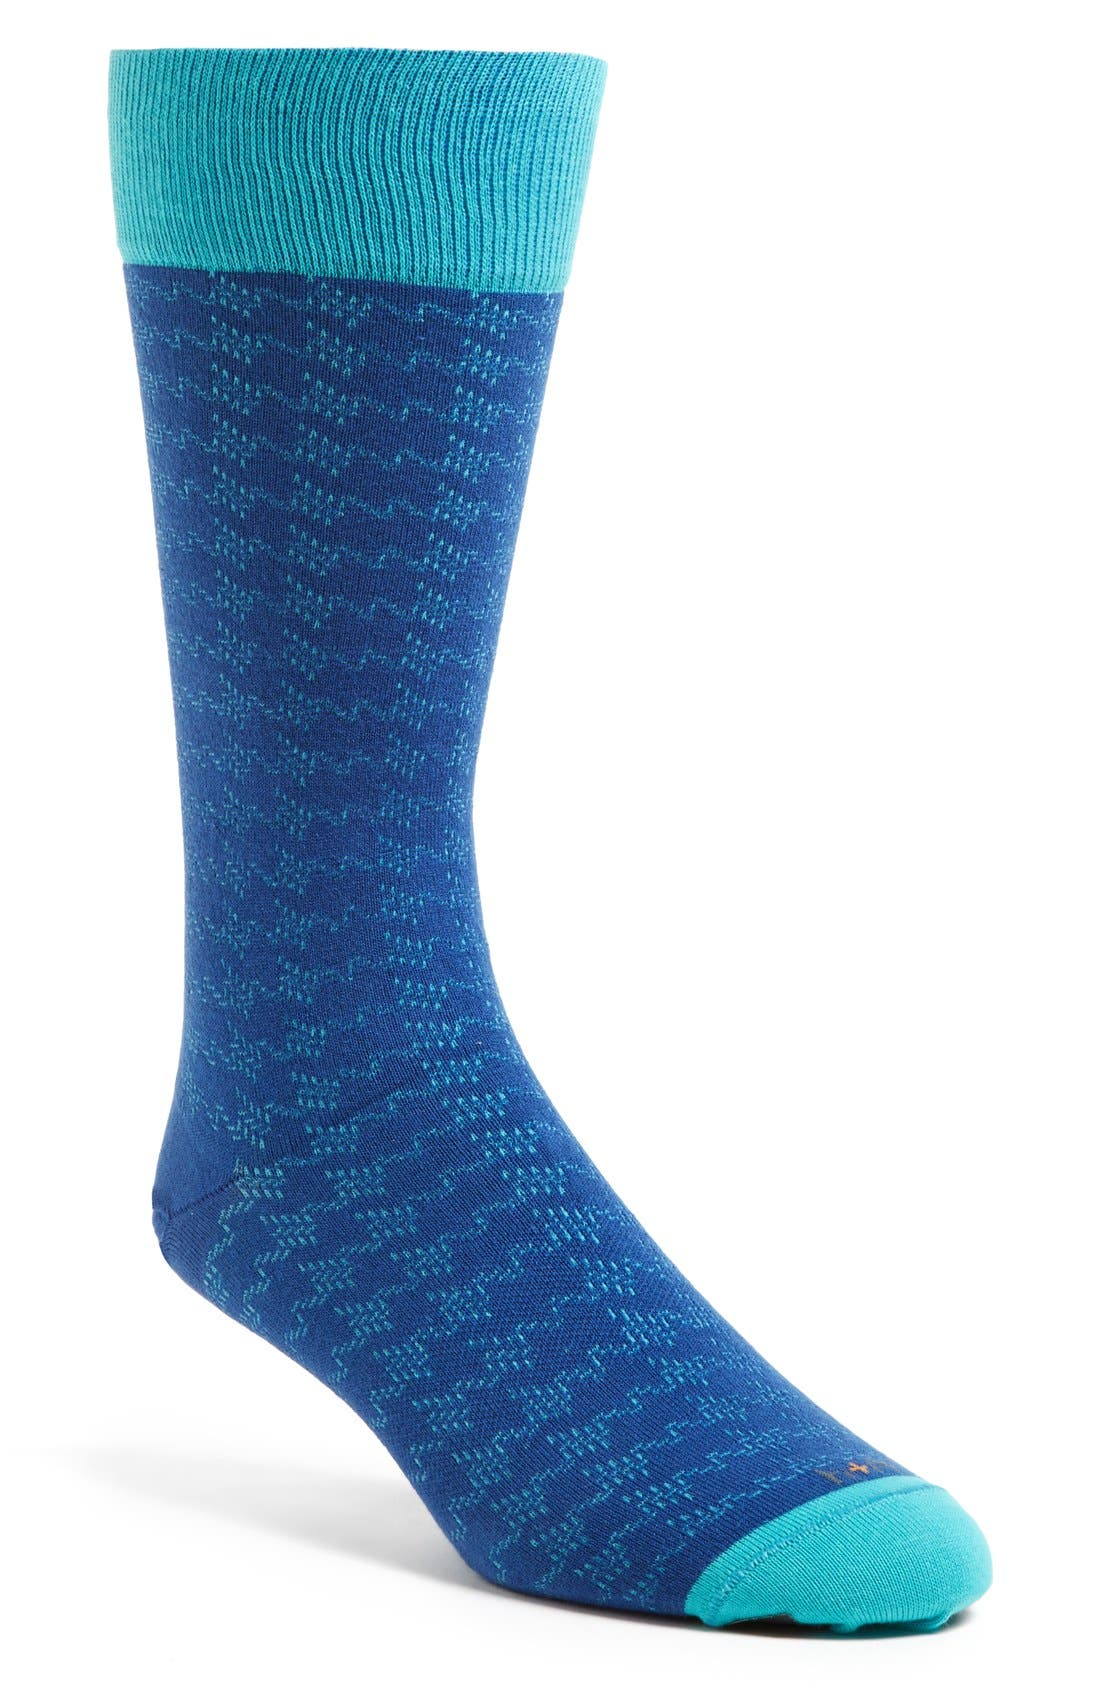 Alternate Image 1 Selected - hook + ALBERT 'Captoe' Socks